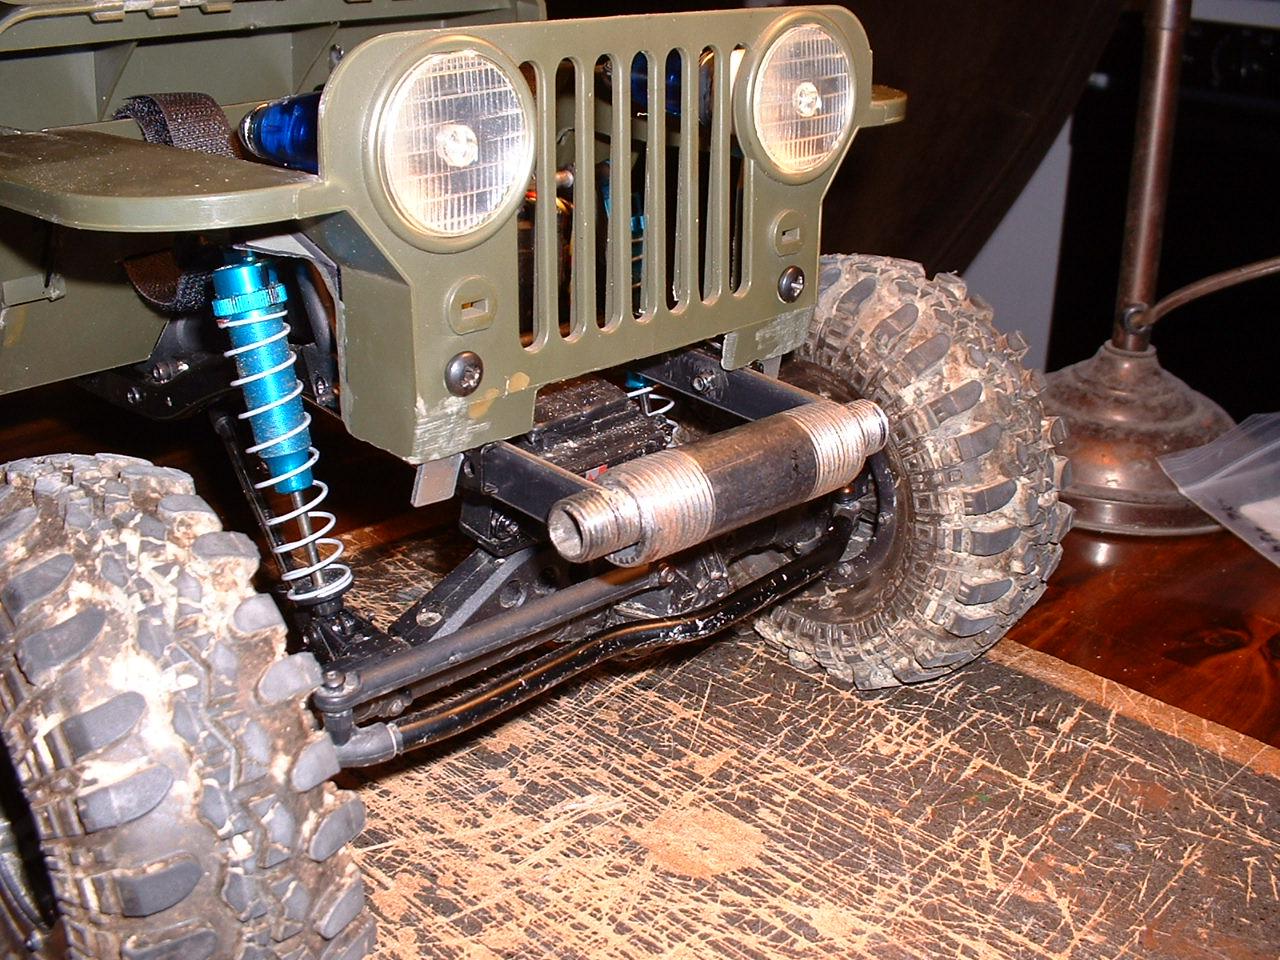 Click image for larger version  Name:G.I. Joe Jeep 6 004.JPG Views:835 Size:345.3 KB ID:2051074